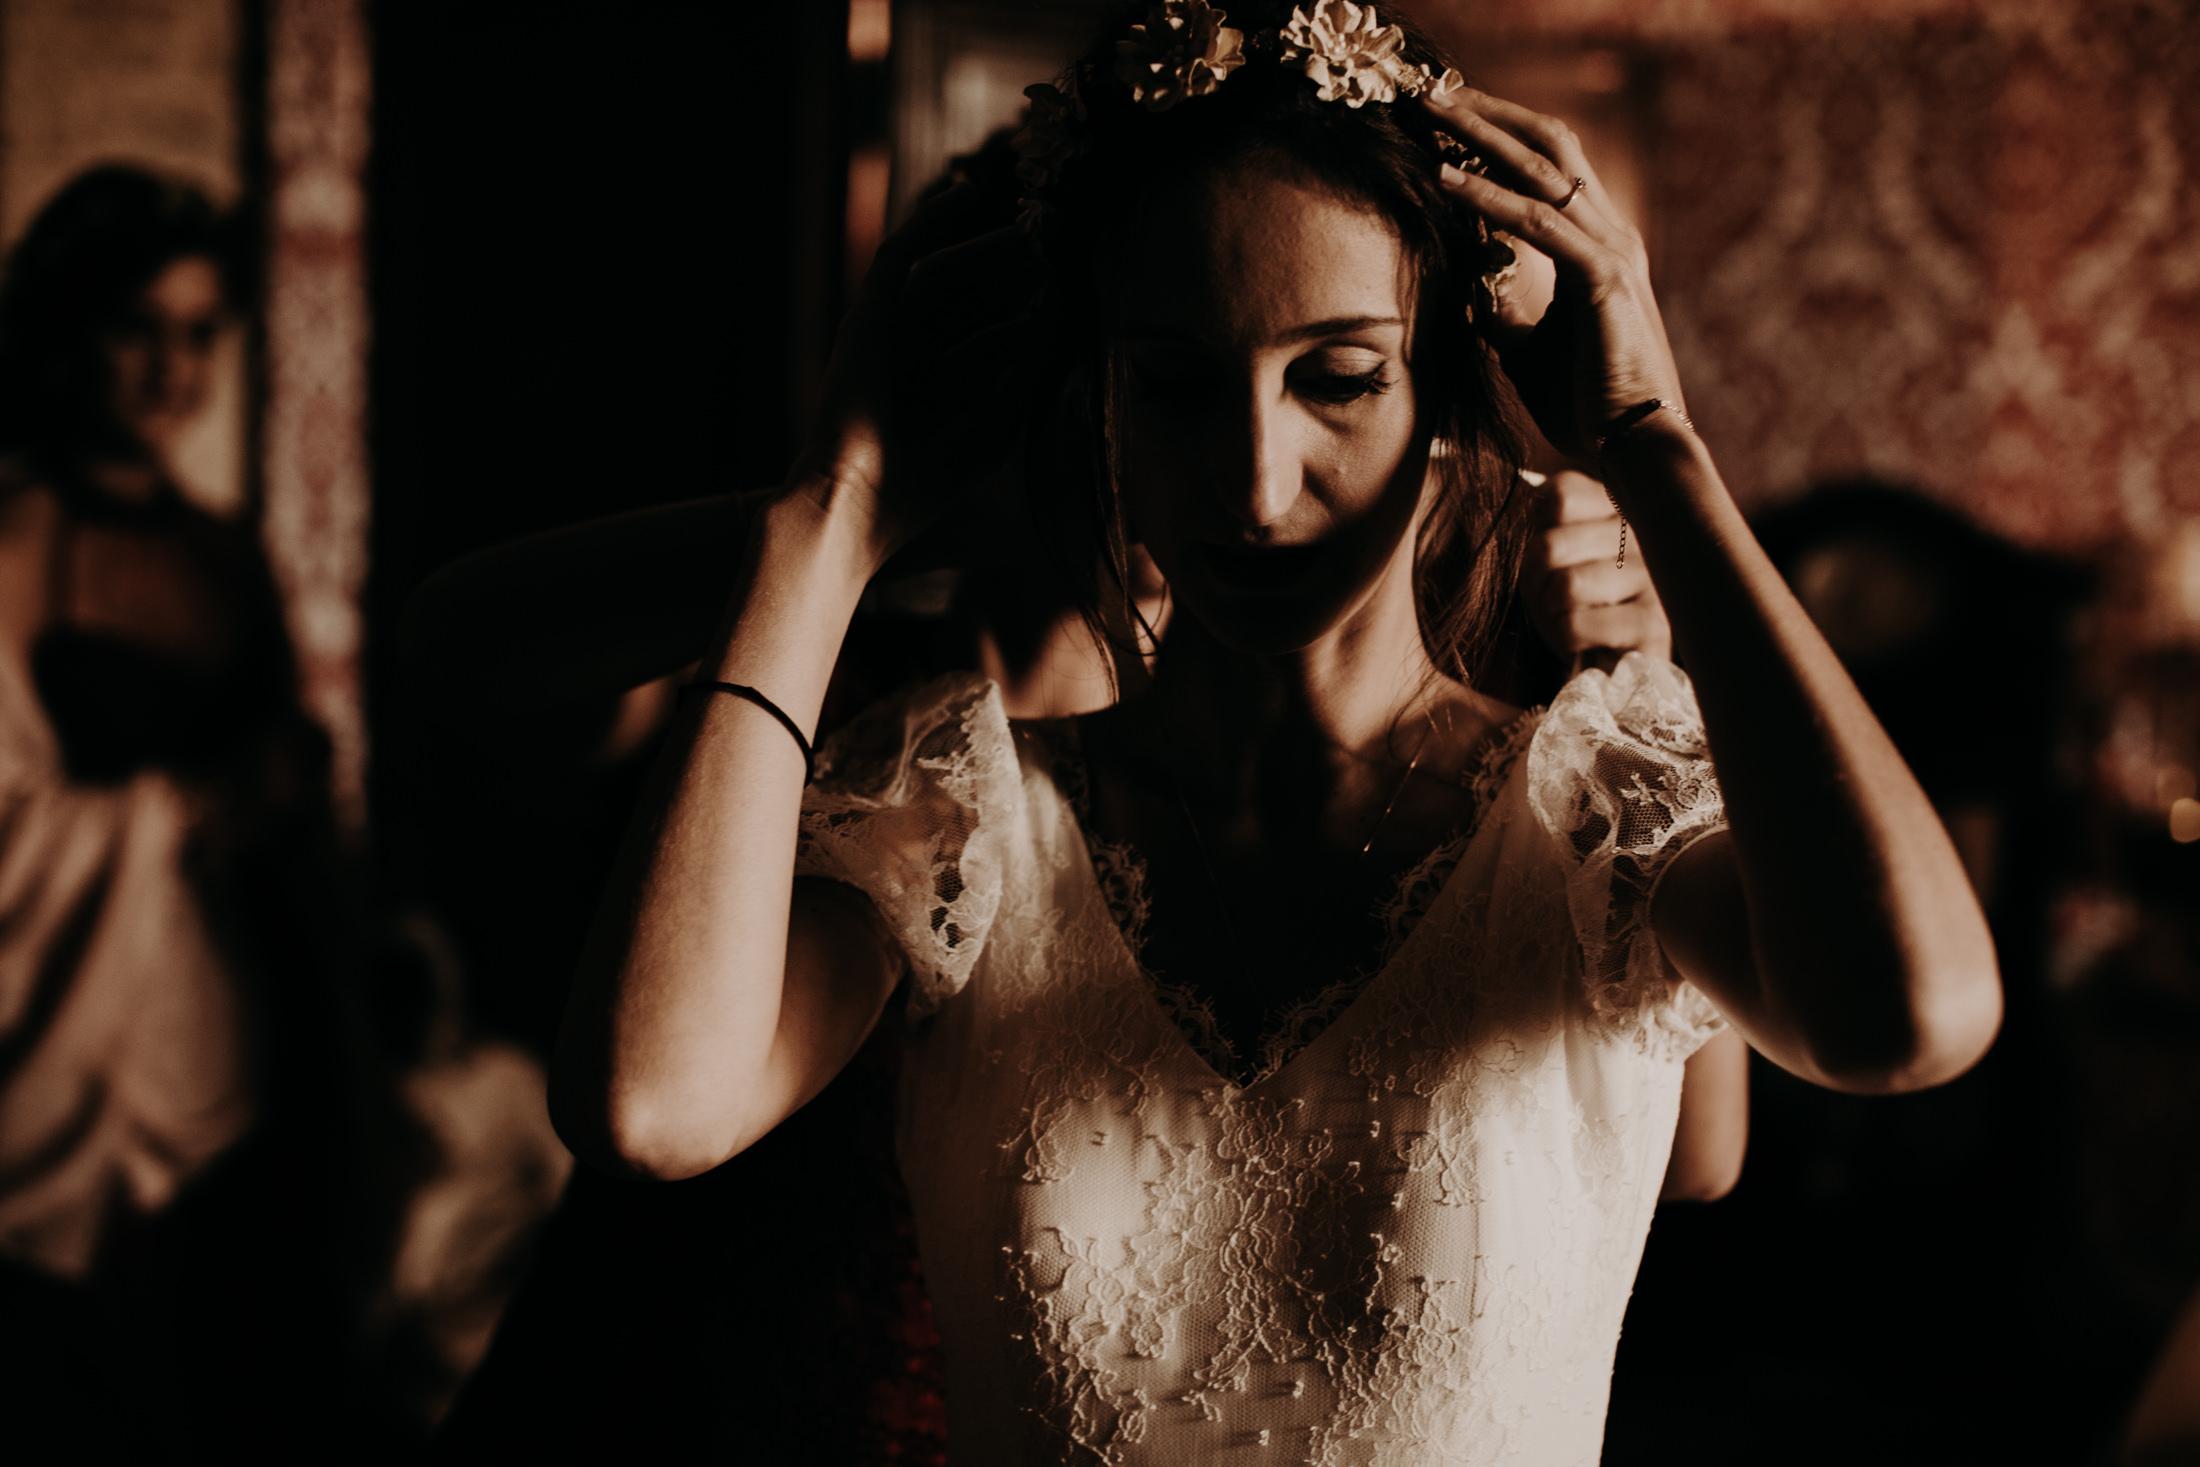 Mariage auvergne photographe wedding_-14.jpg